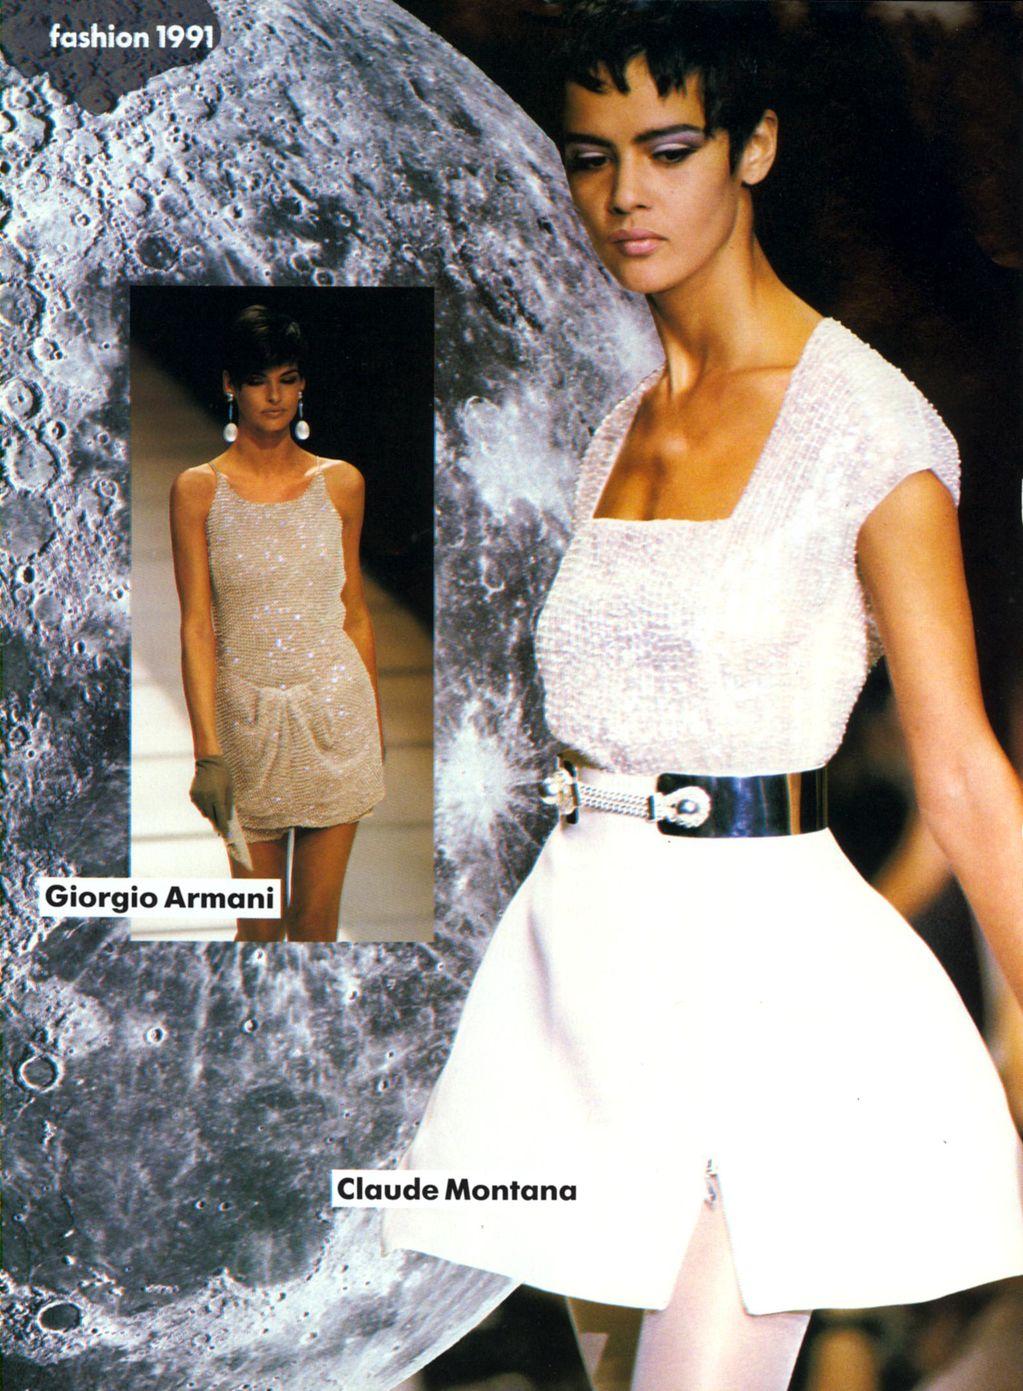 Vogue (US) January 1991 | Fashion 1991 11.jpg